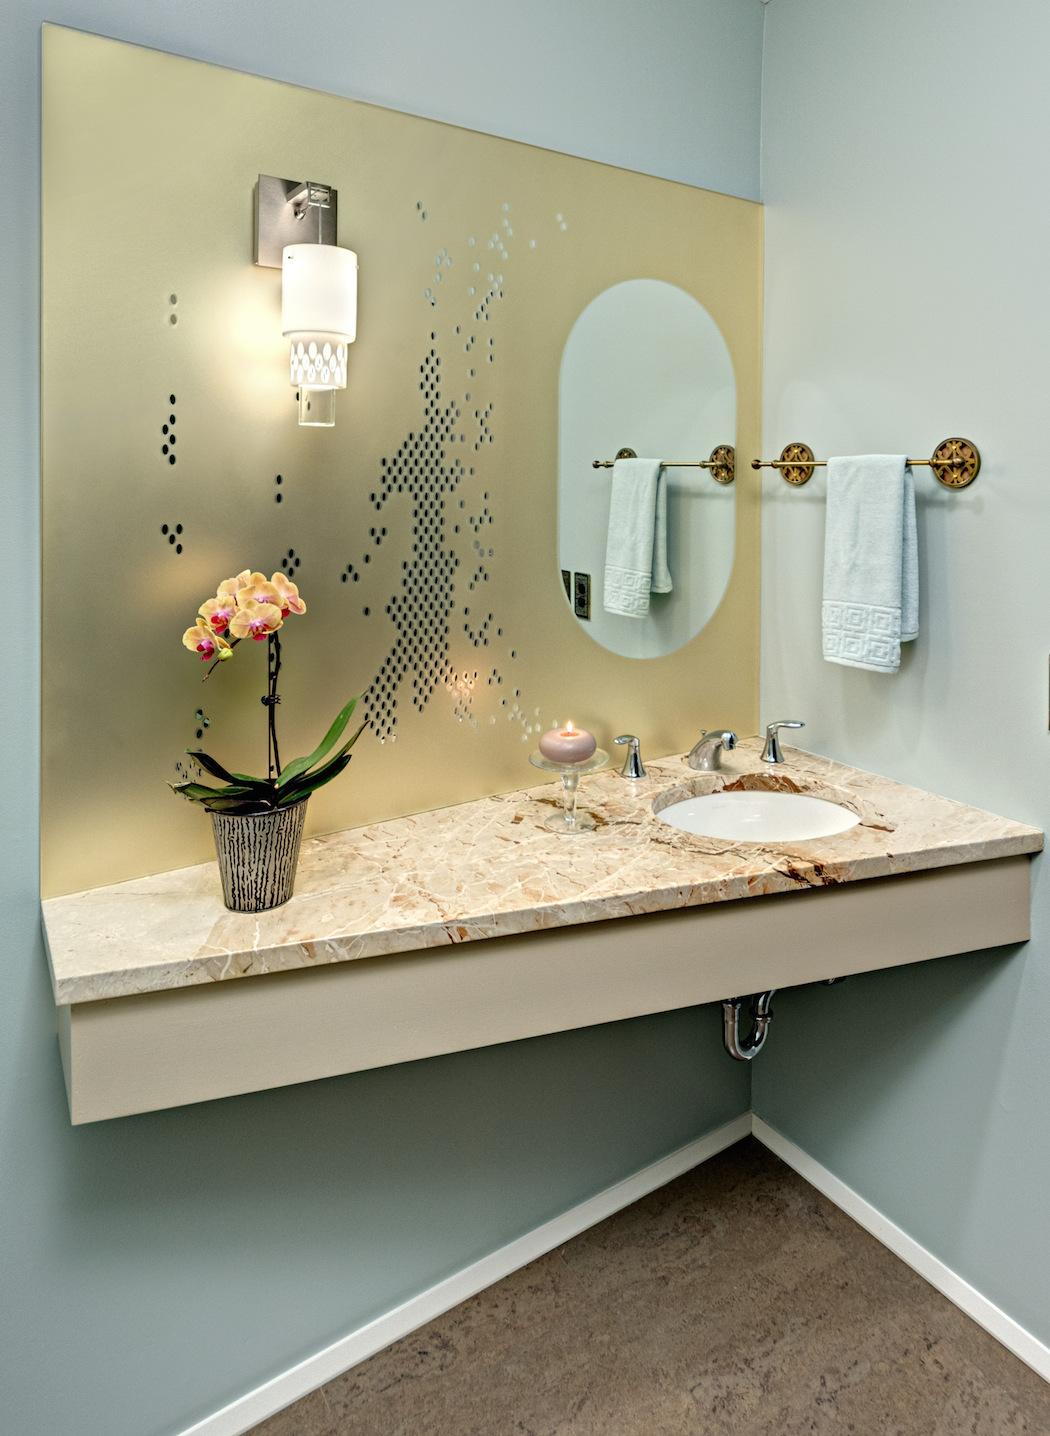 img-dream-kitchen-bath_powder-room_X